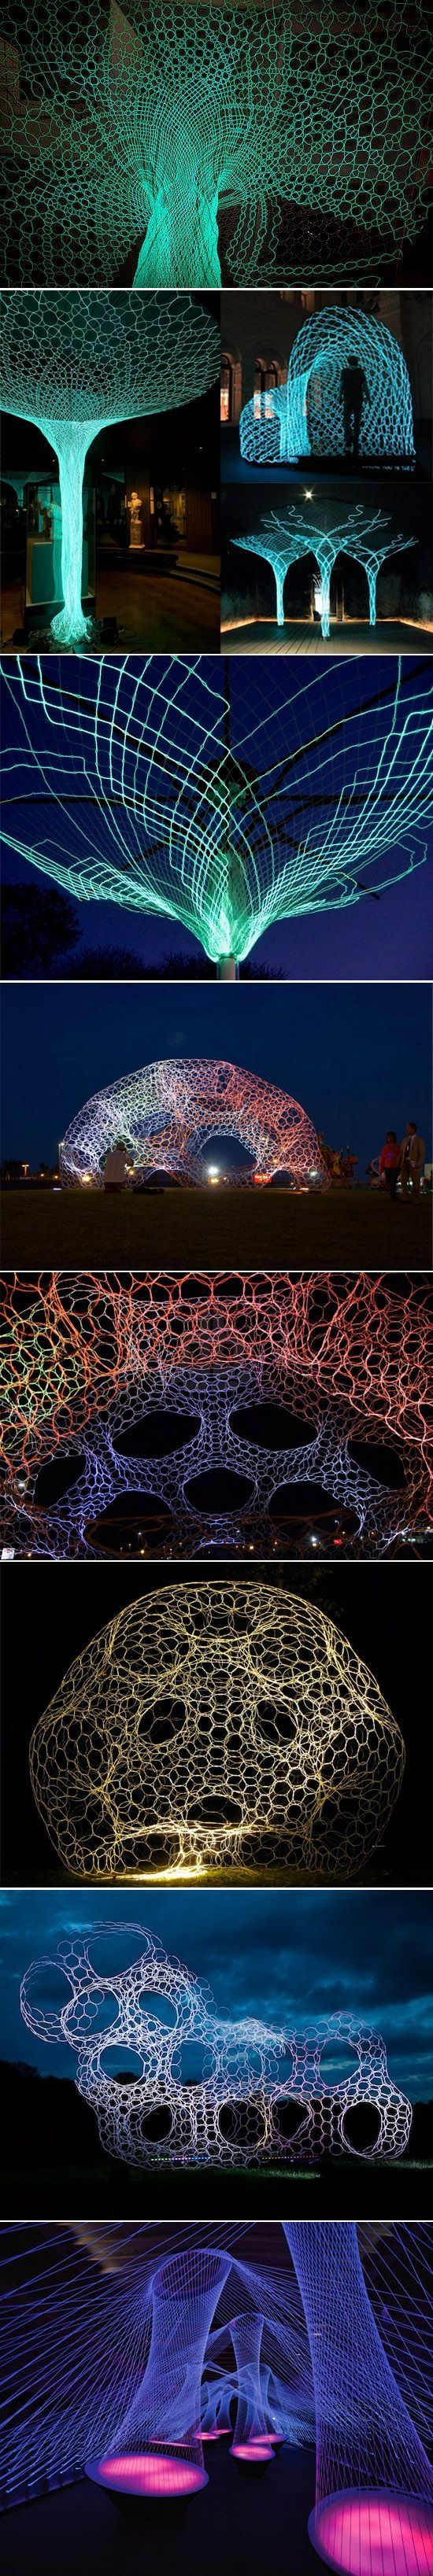 Loop.pH Studio // ephemeral textile architecture and living environments.